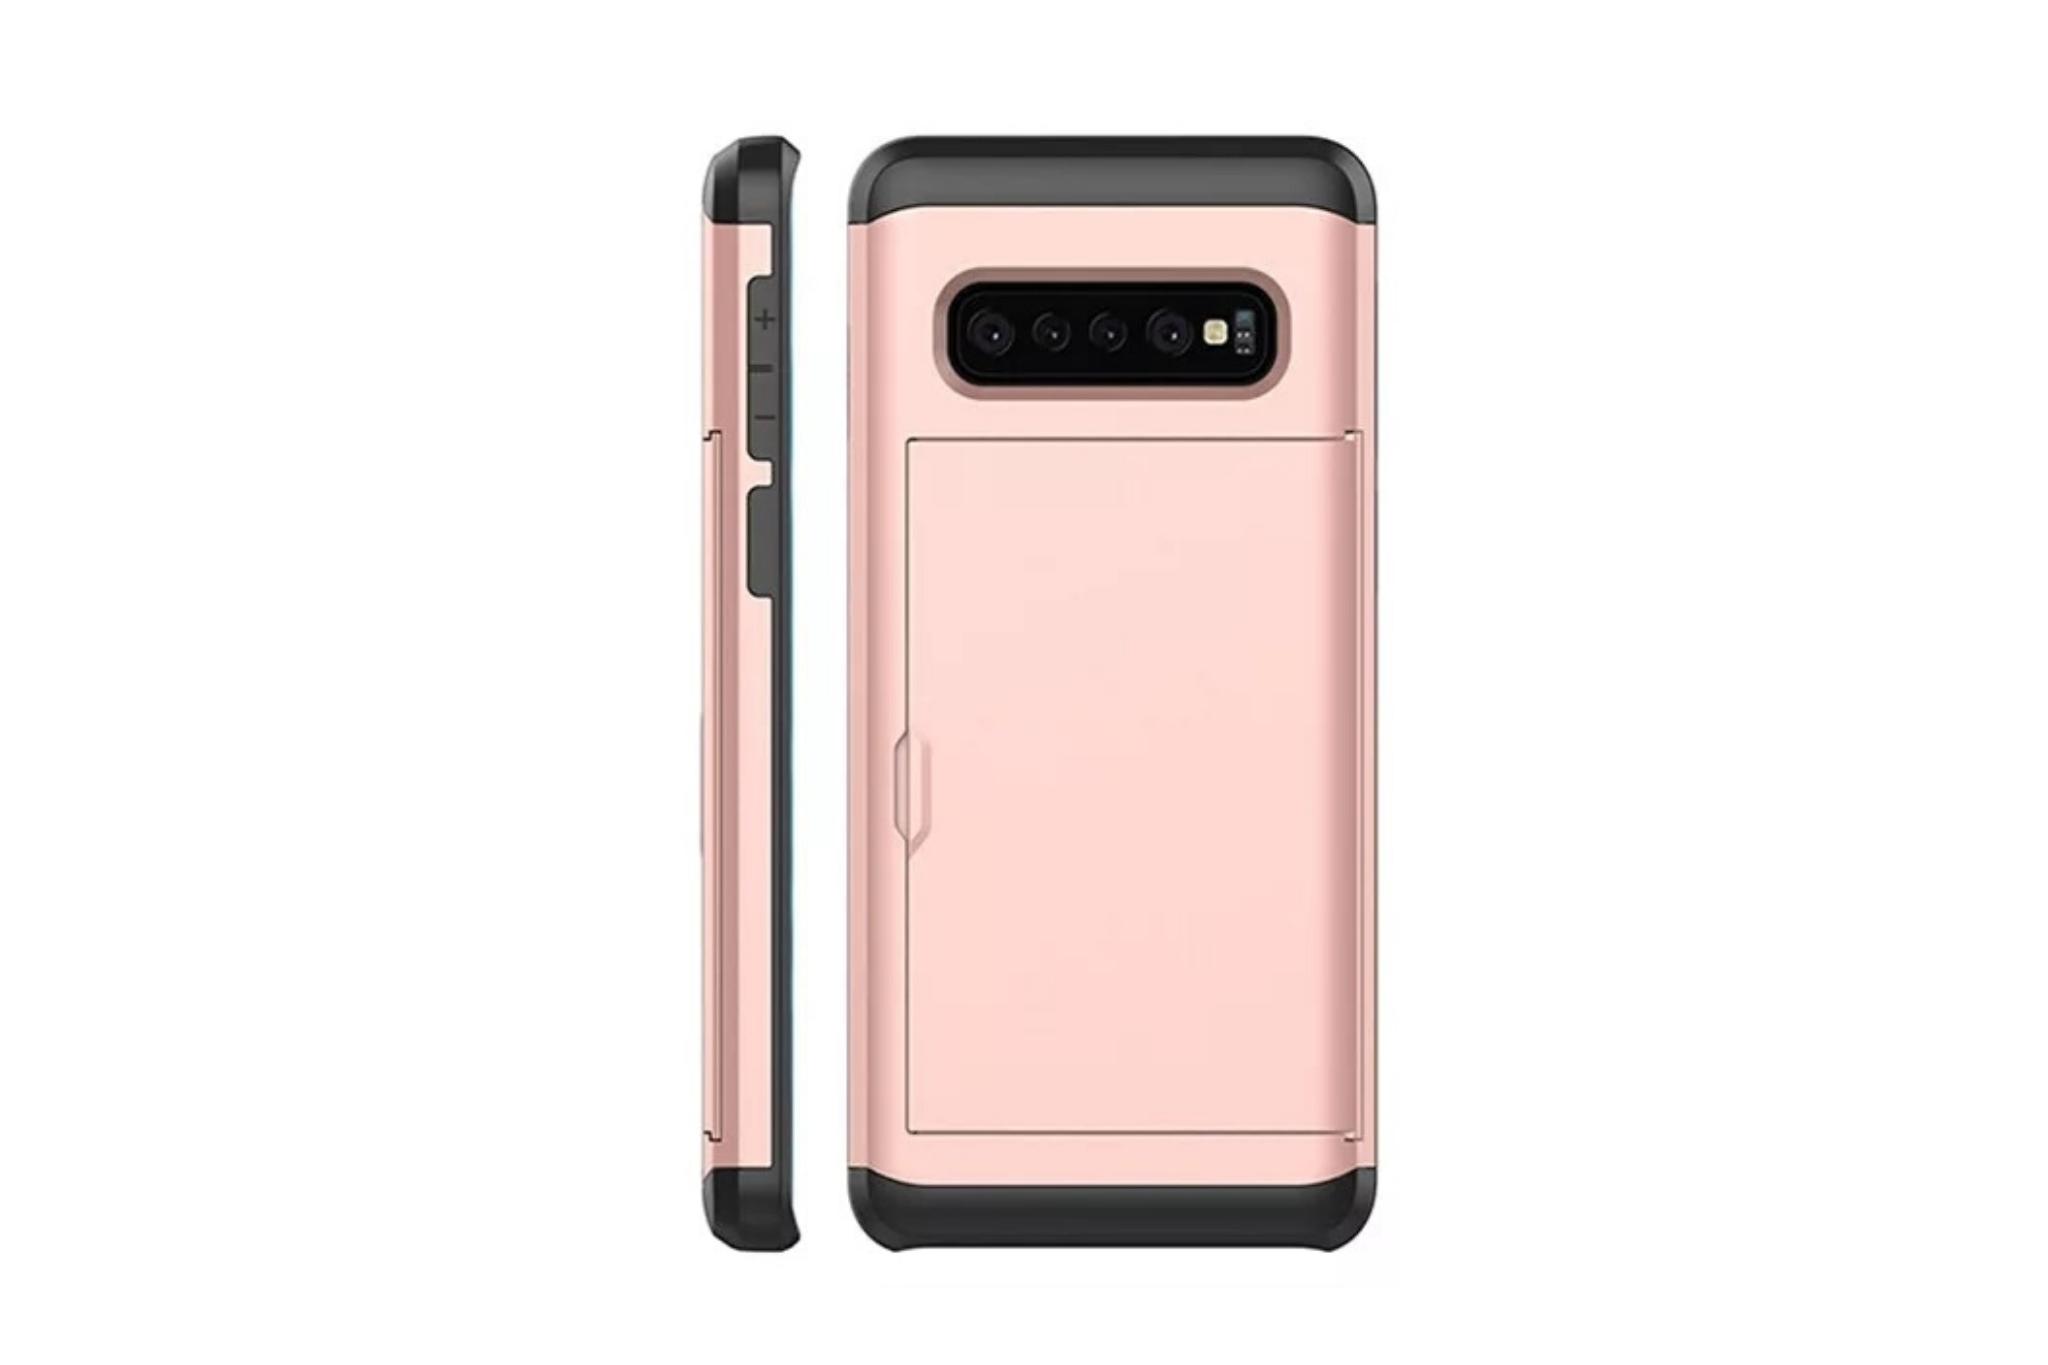 Smartphonehoesje Samsung Note 10 | Pasjesschuif Rose gold